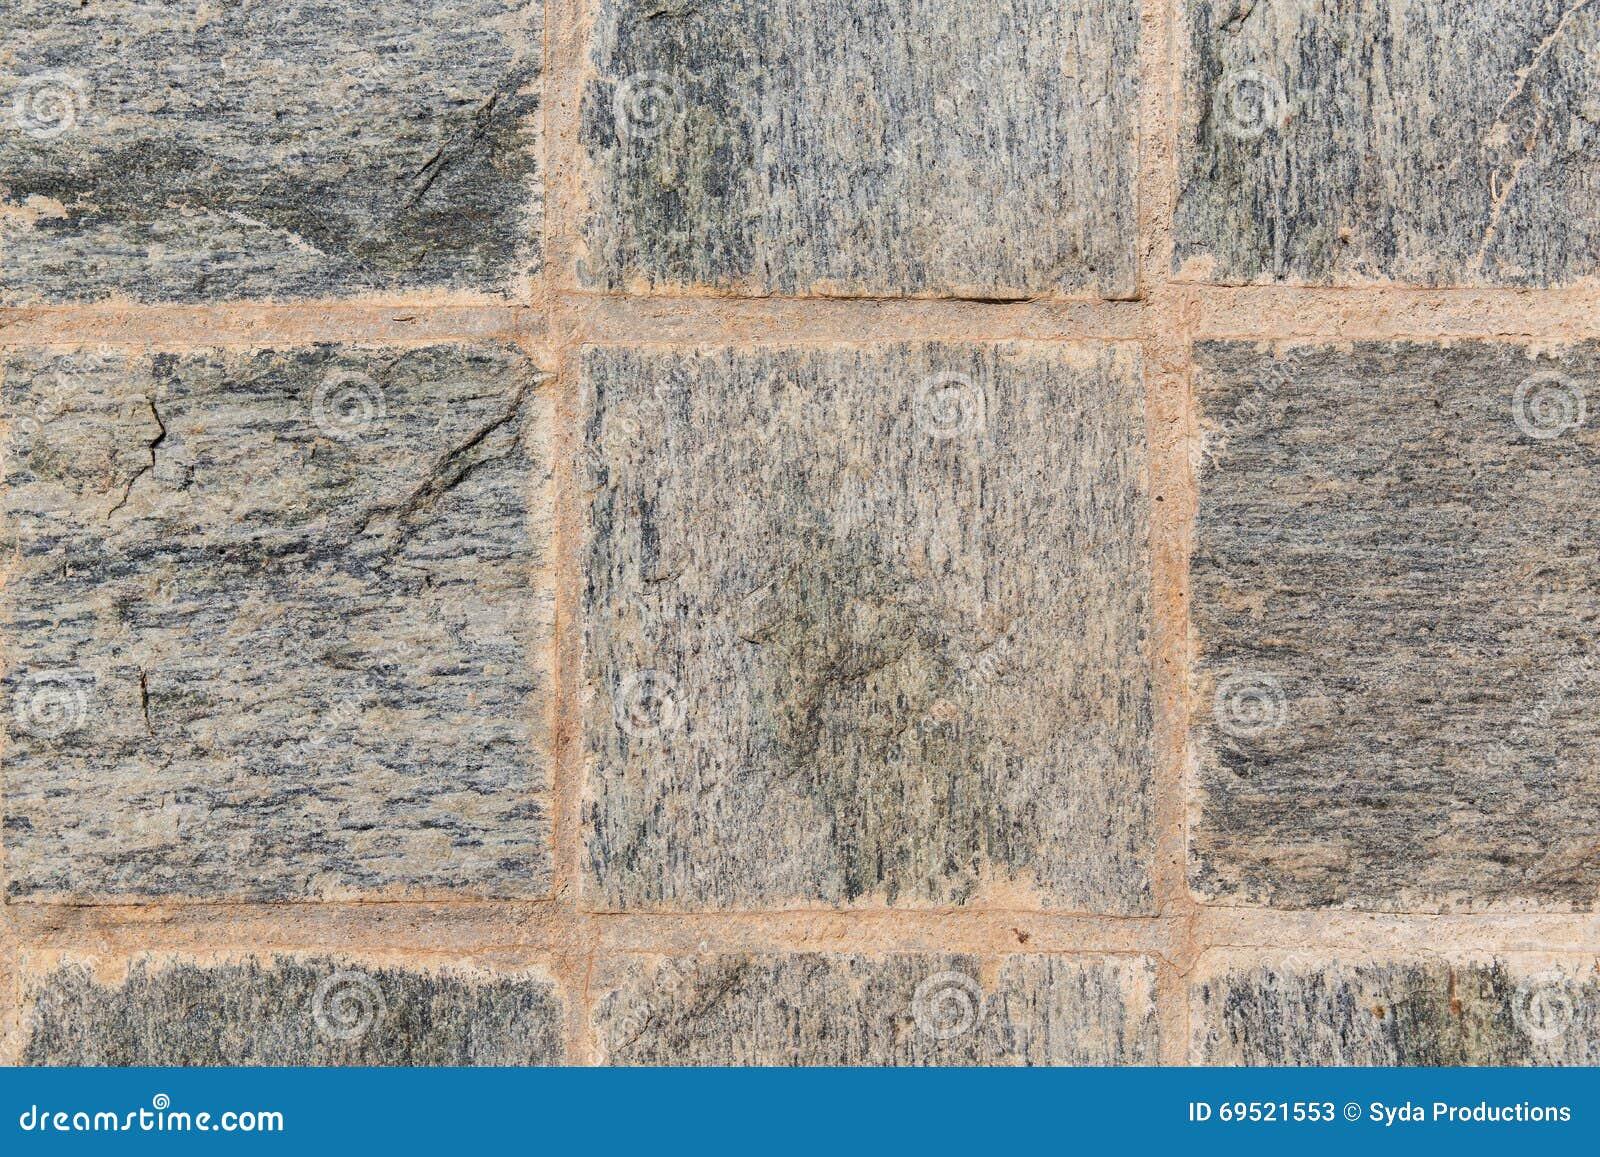 Pietre per facciate great di e with pietre per facciate